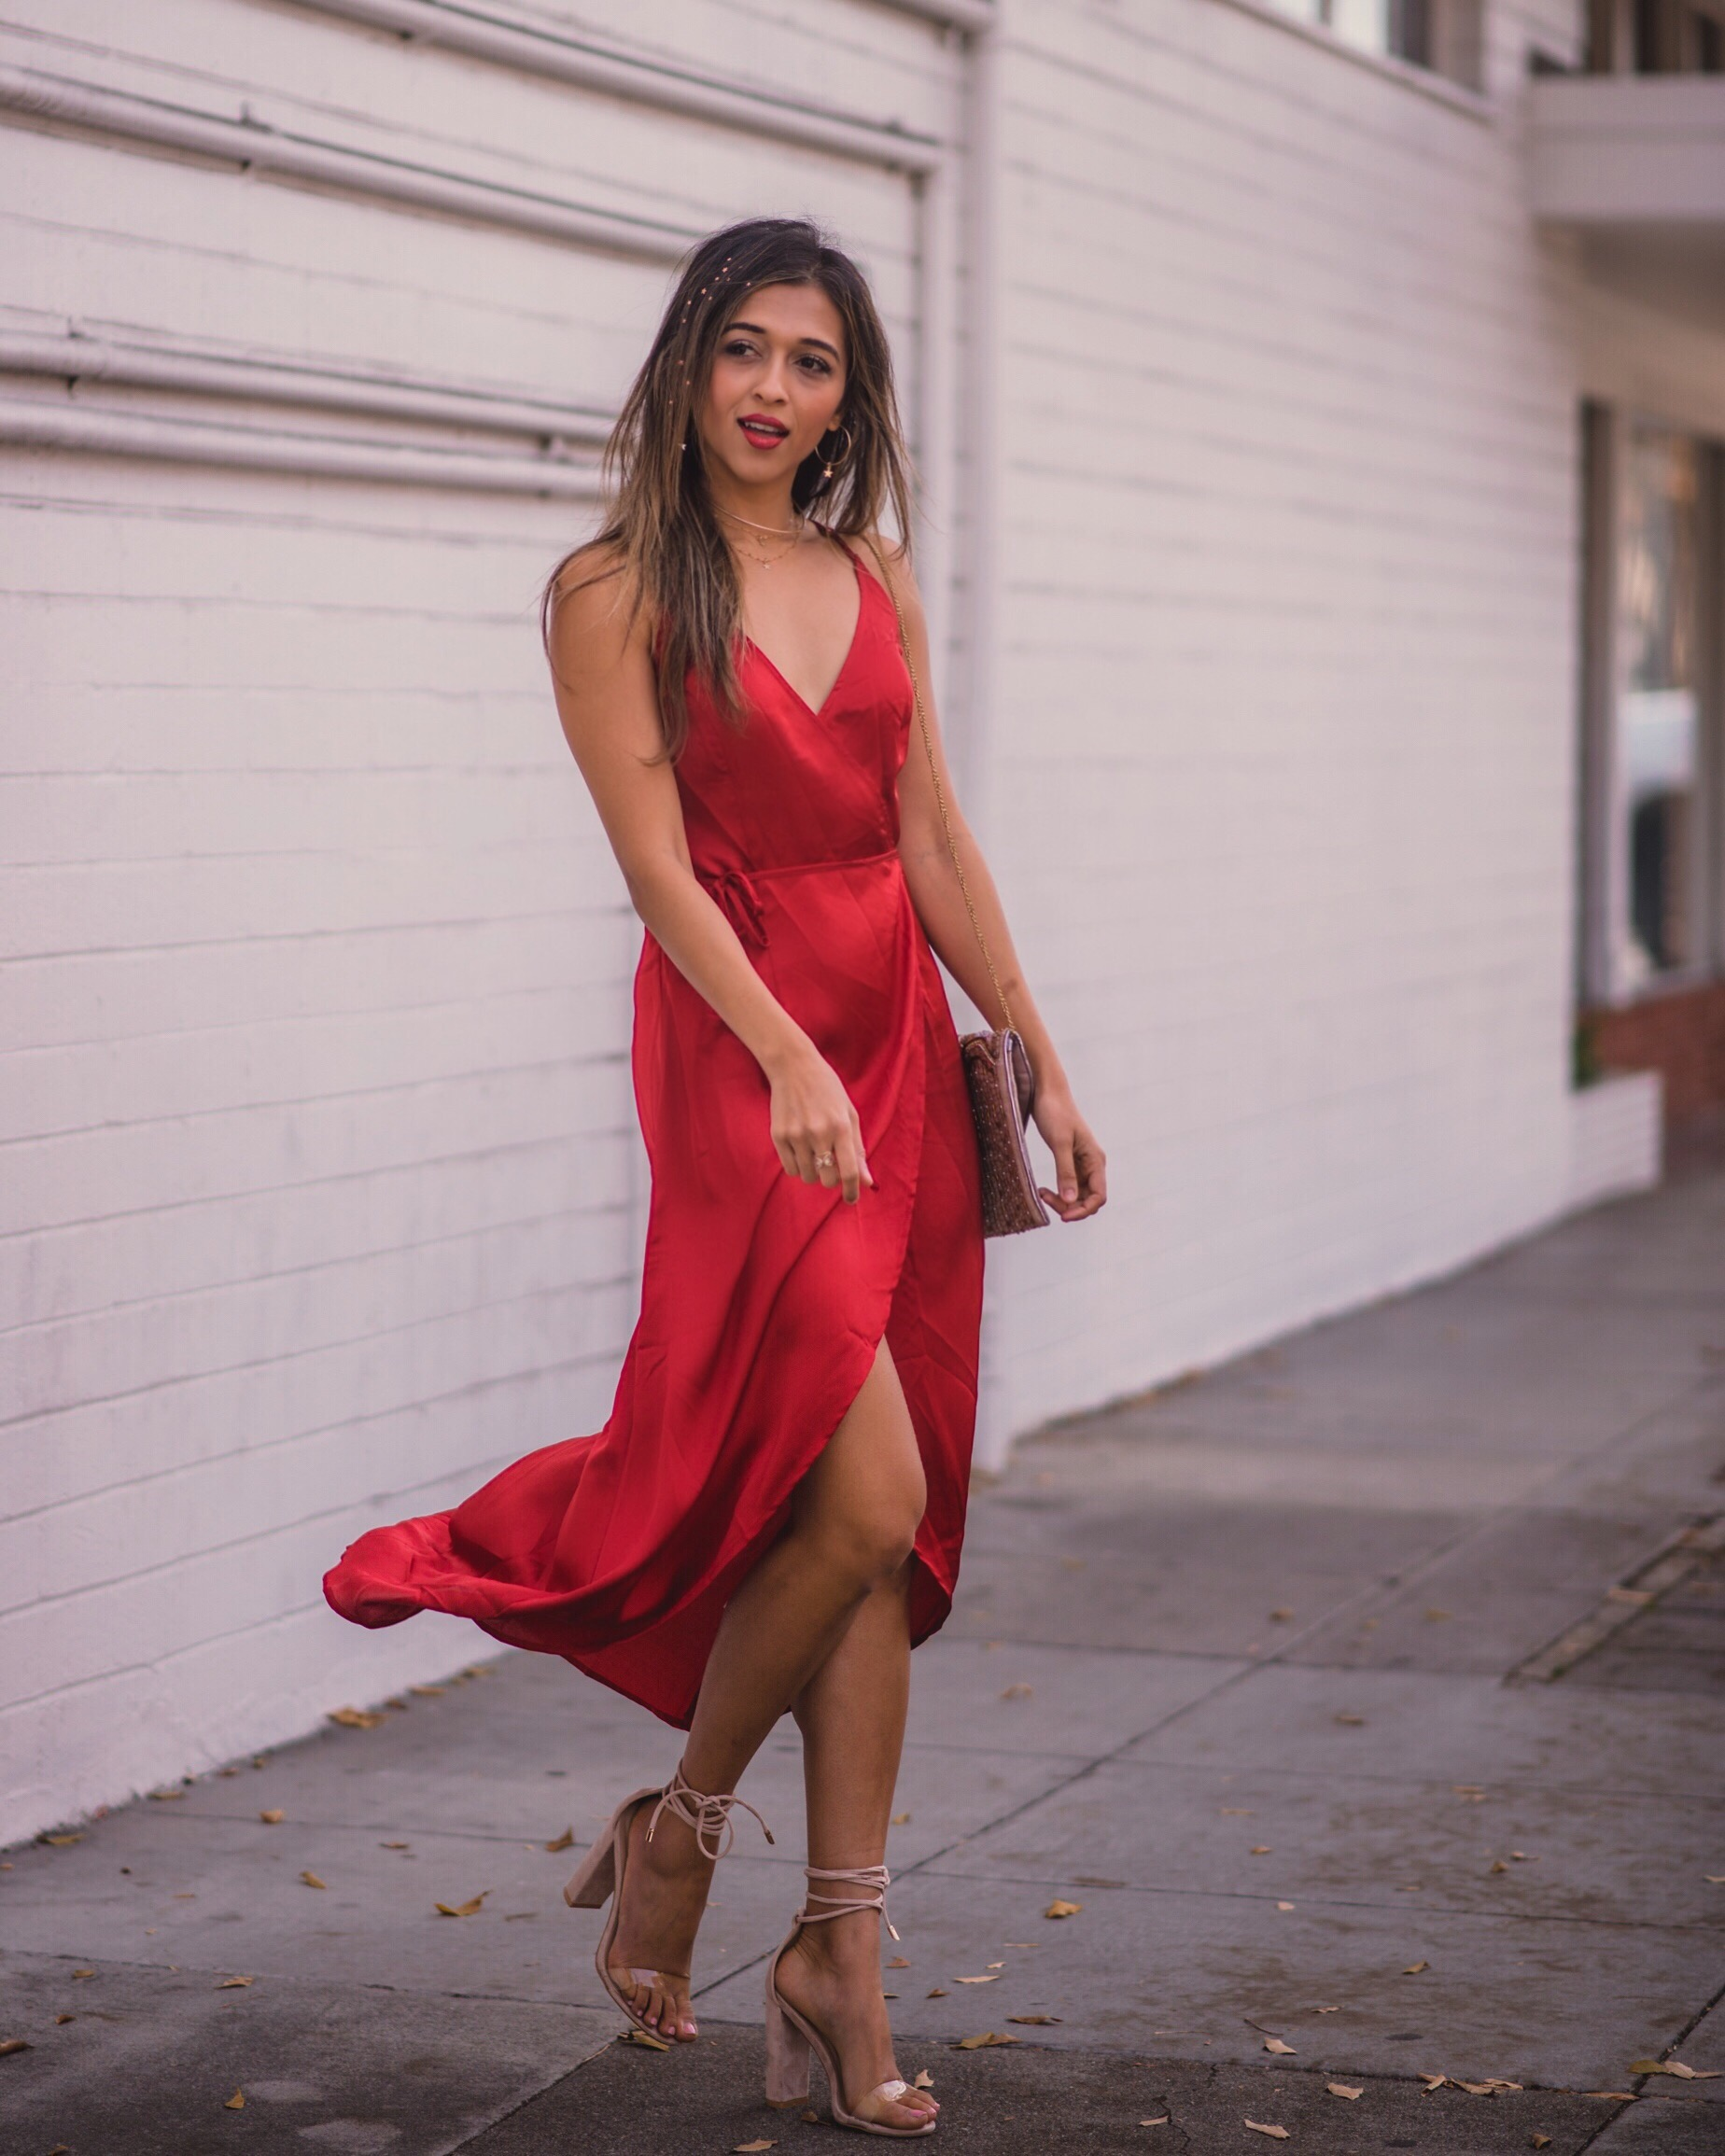 Classic Red Dresses